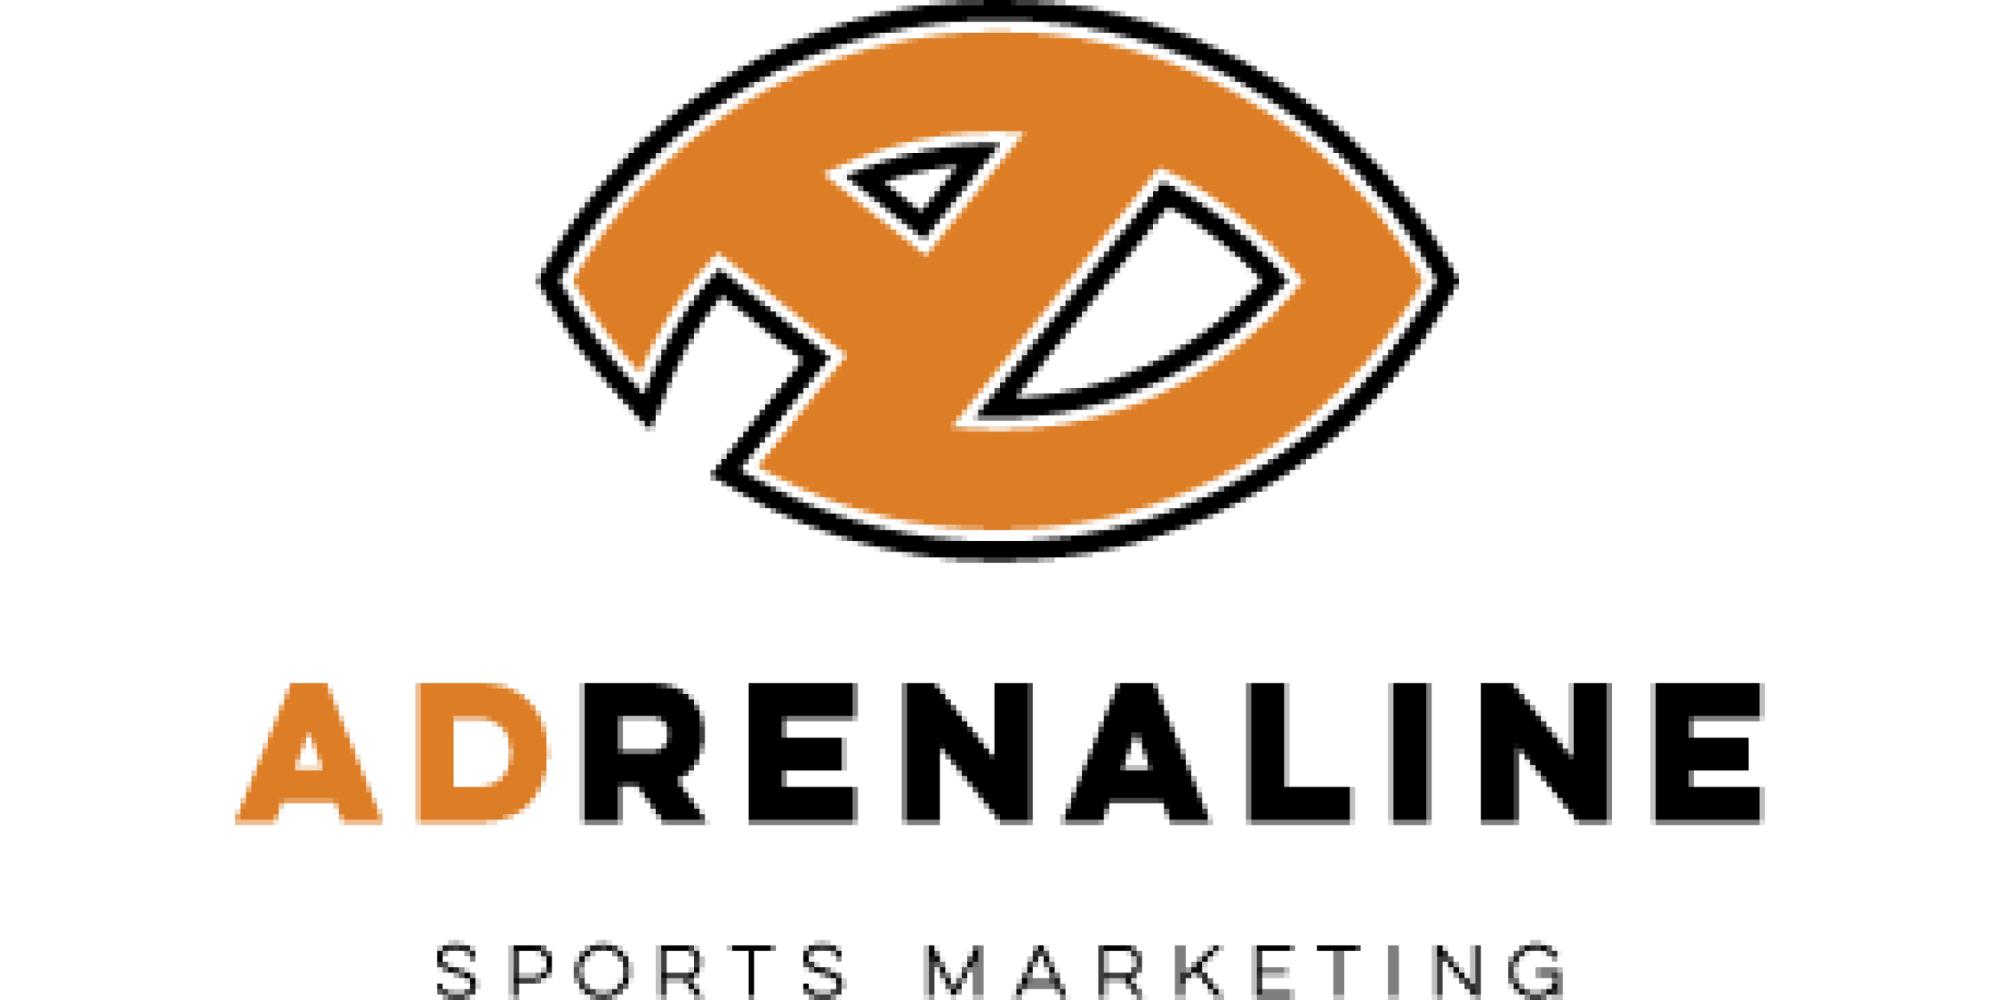 Adrenaline Sports Marketing